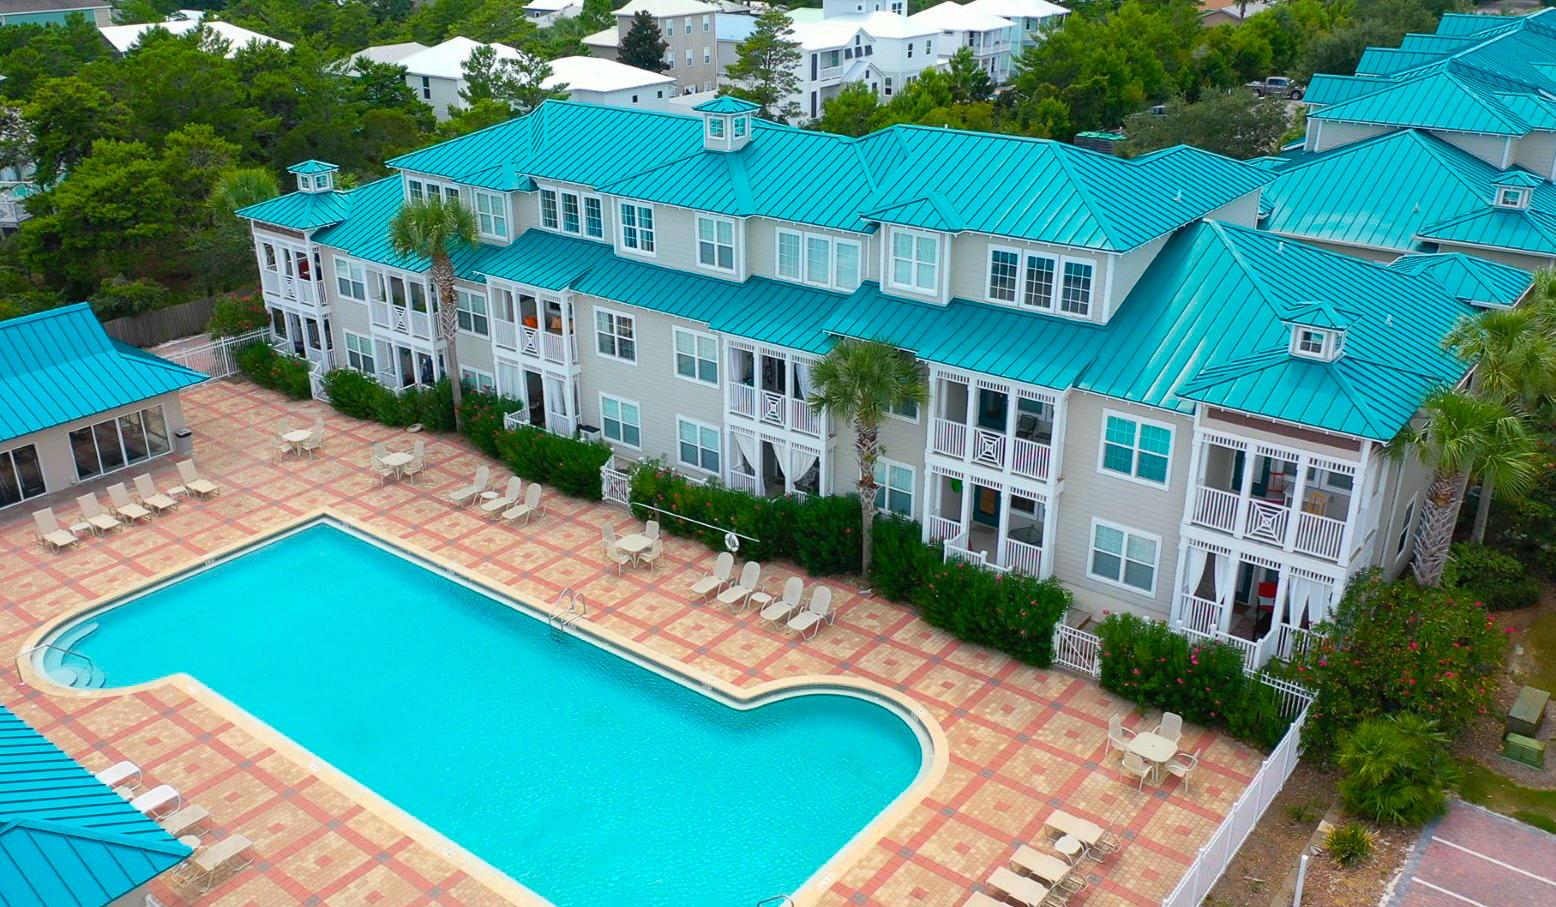 A 4 Bedroom 2 Bedroom Village At Blue Mountain Beach Condominium